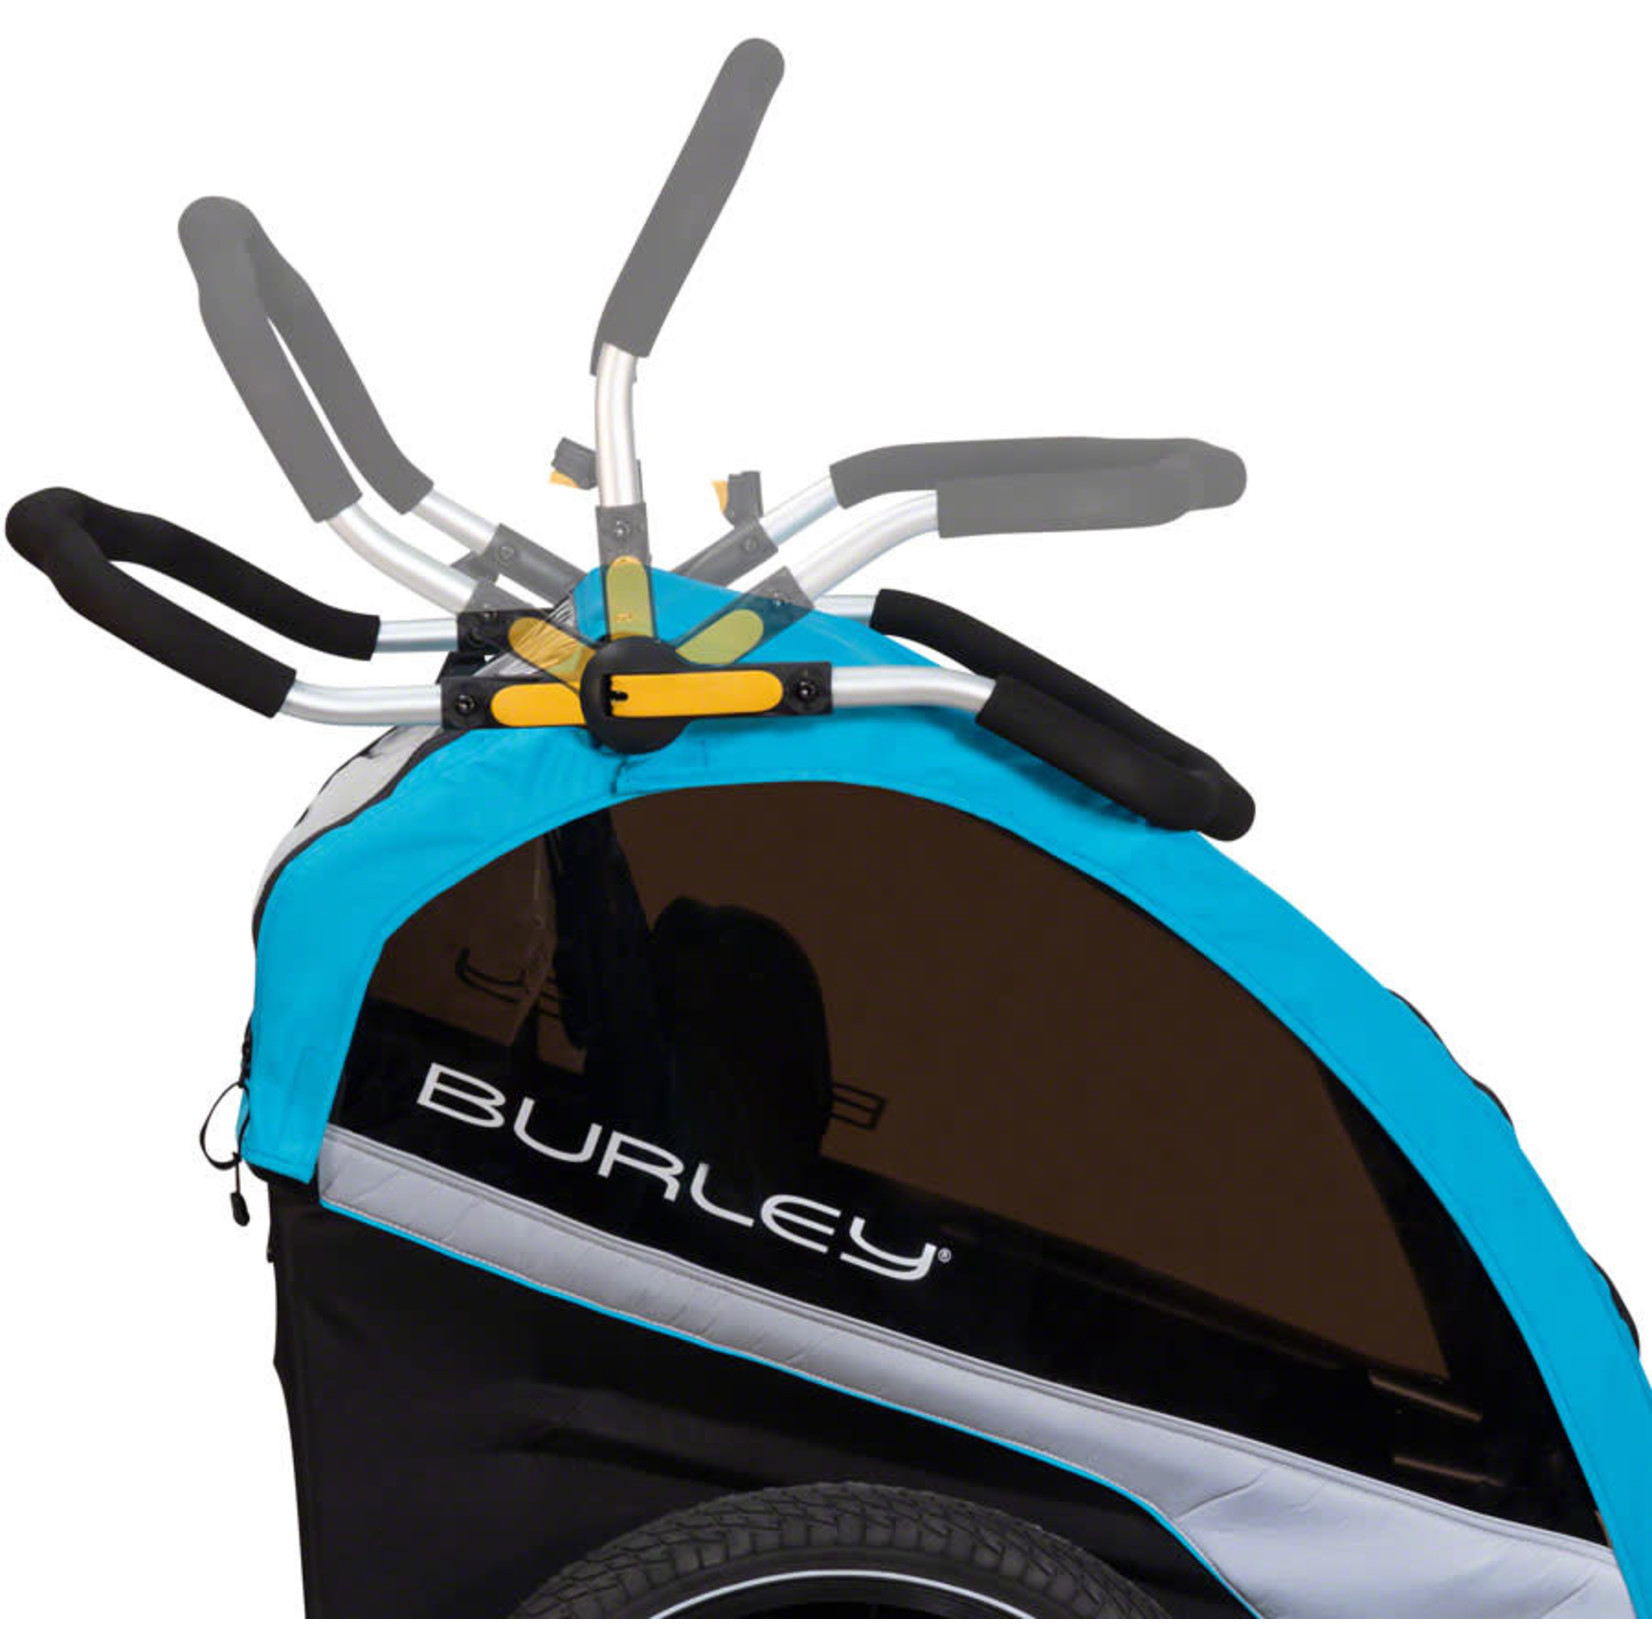 Burley Burley, D'Lite X Child Trailer, Aqua